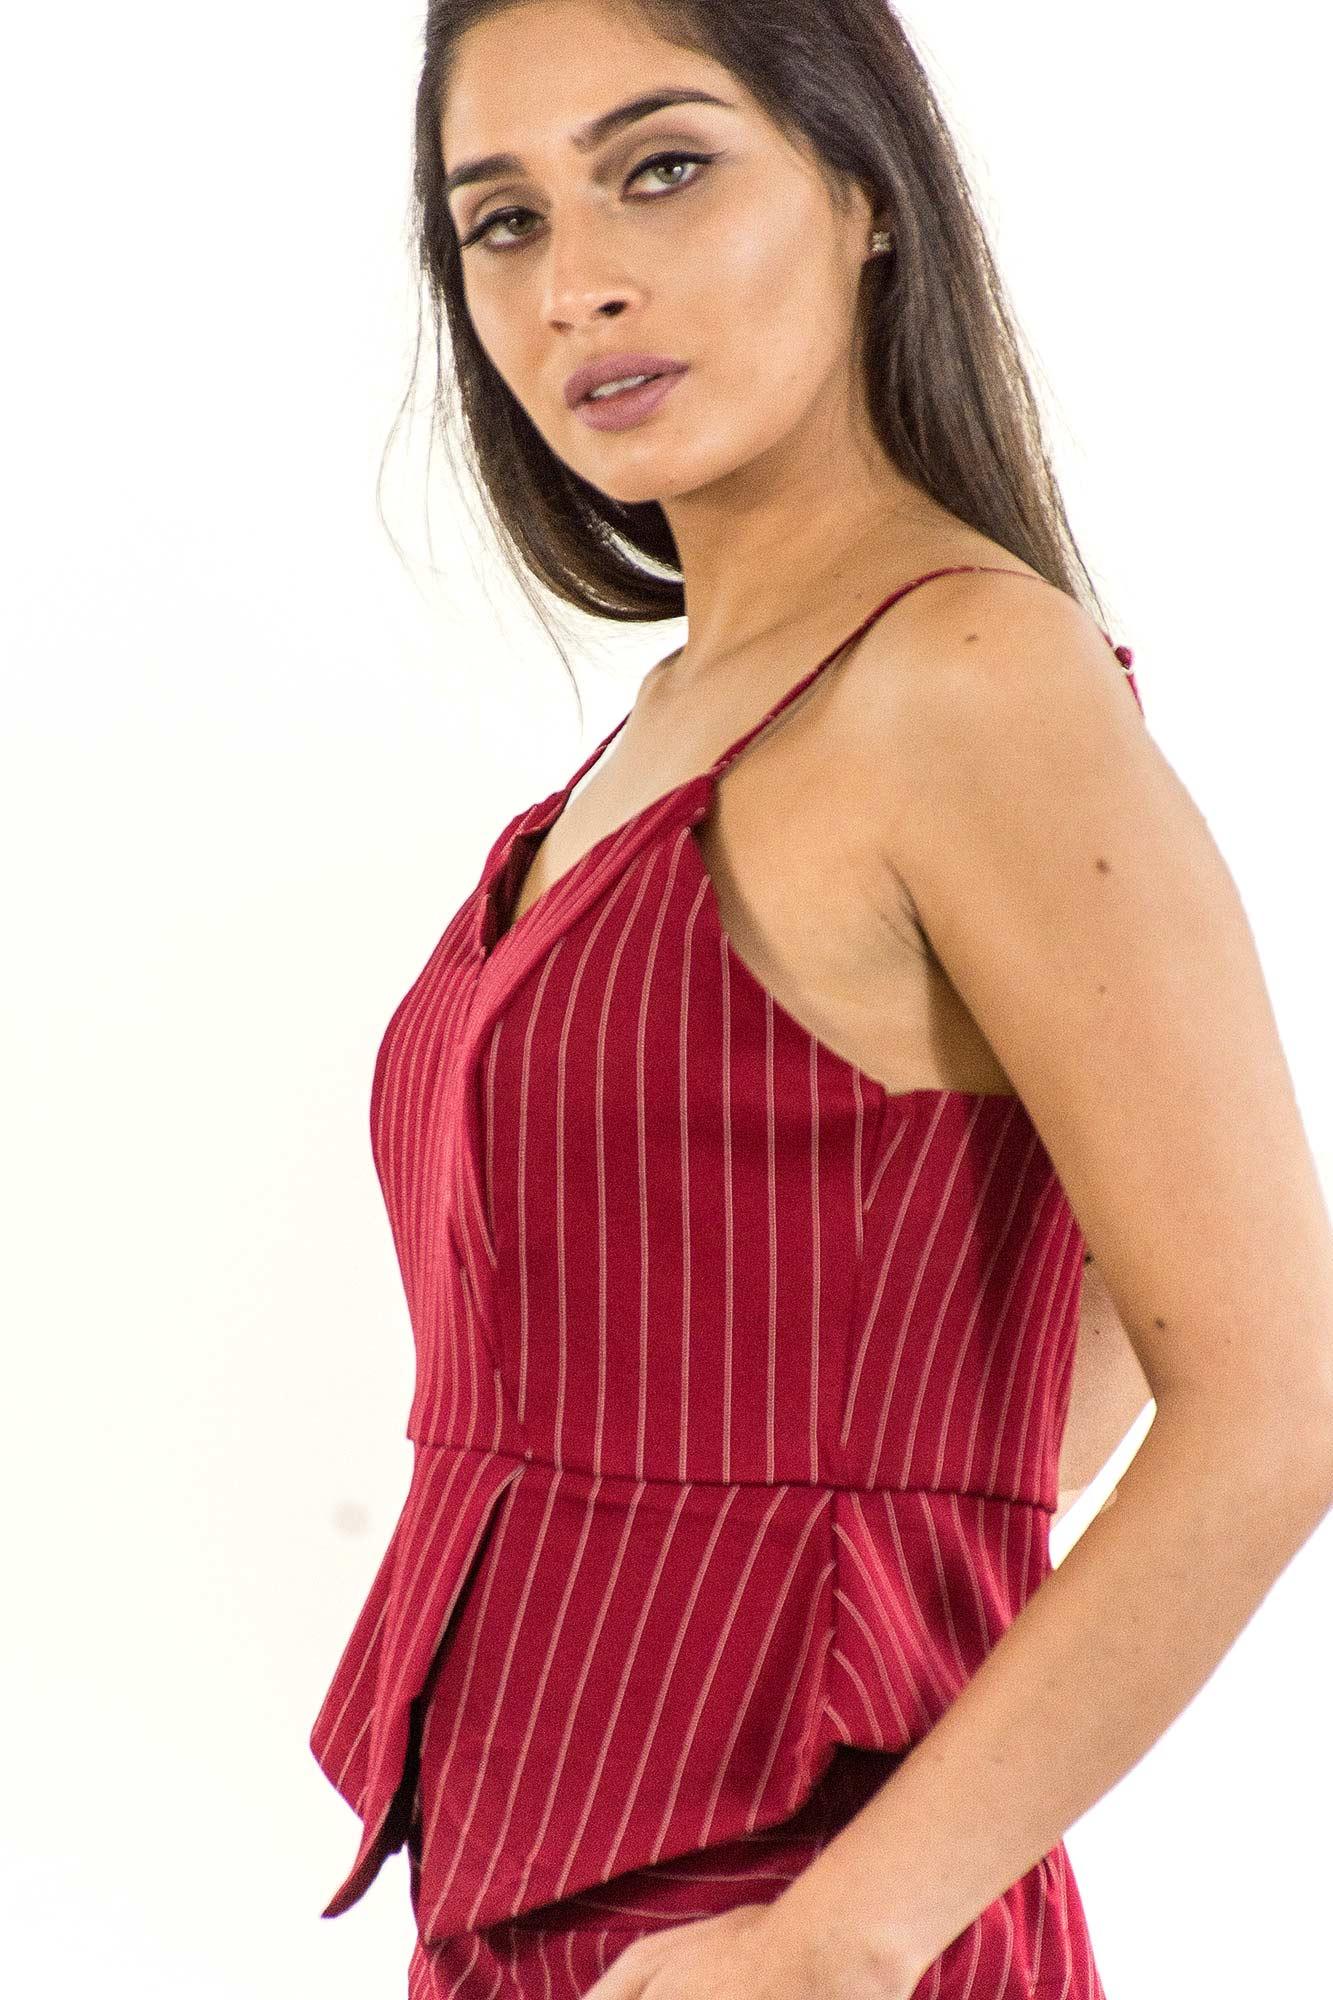 9096f7456 NotoriaStore: Moda Feminina Florianópolis - Online Cropped risca de giz